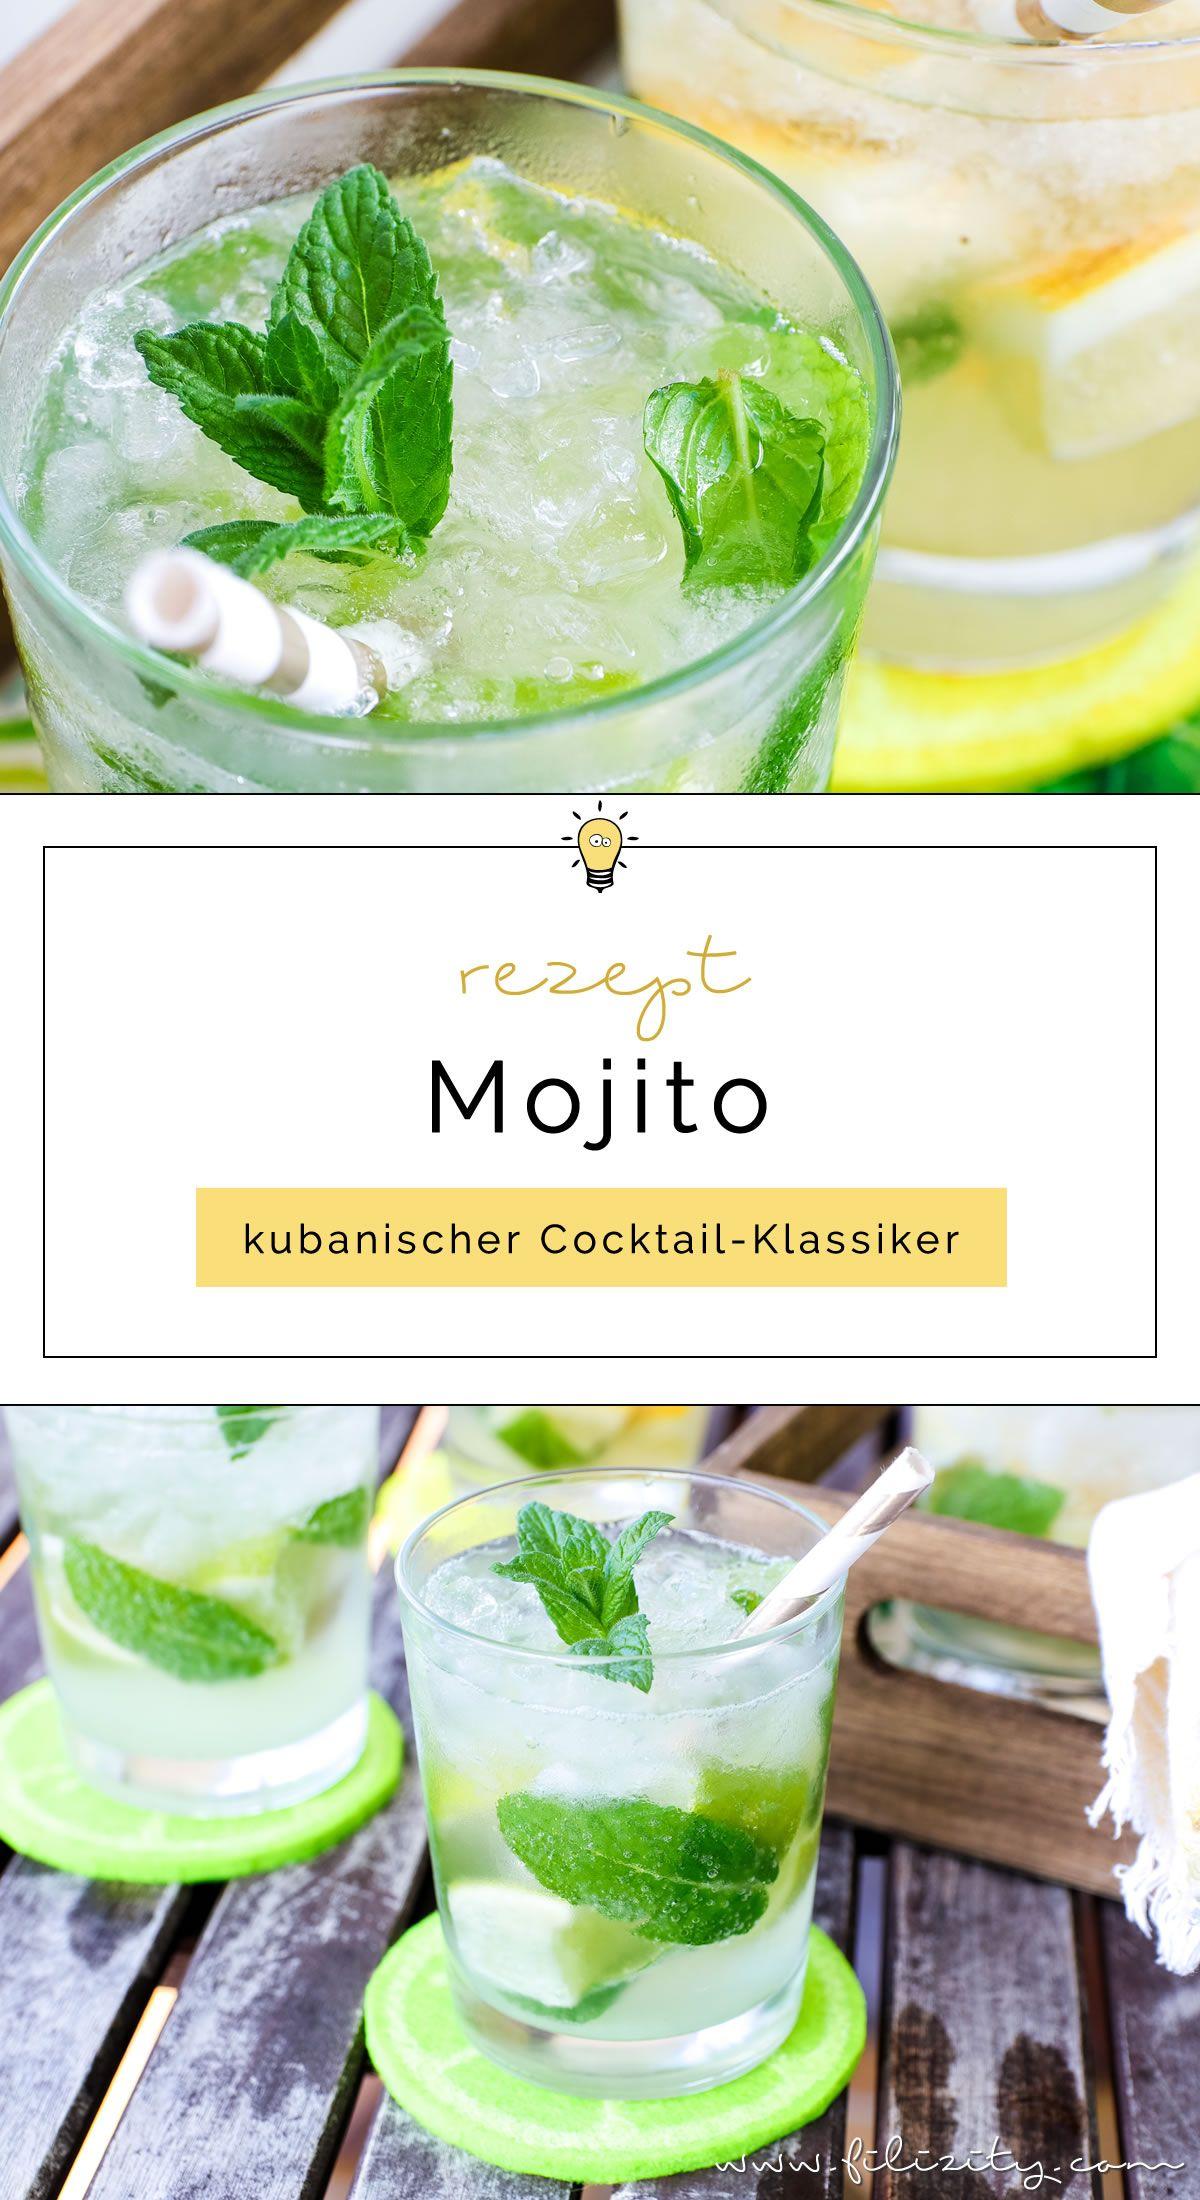 Mojito Rezept Kubanischer Cocktail Klassiker Filizity Com Food Blog Aus Dem Rheinland Mojito Rezept Mojito Coctail Rezepte